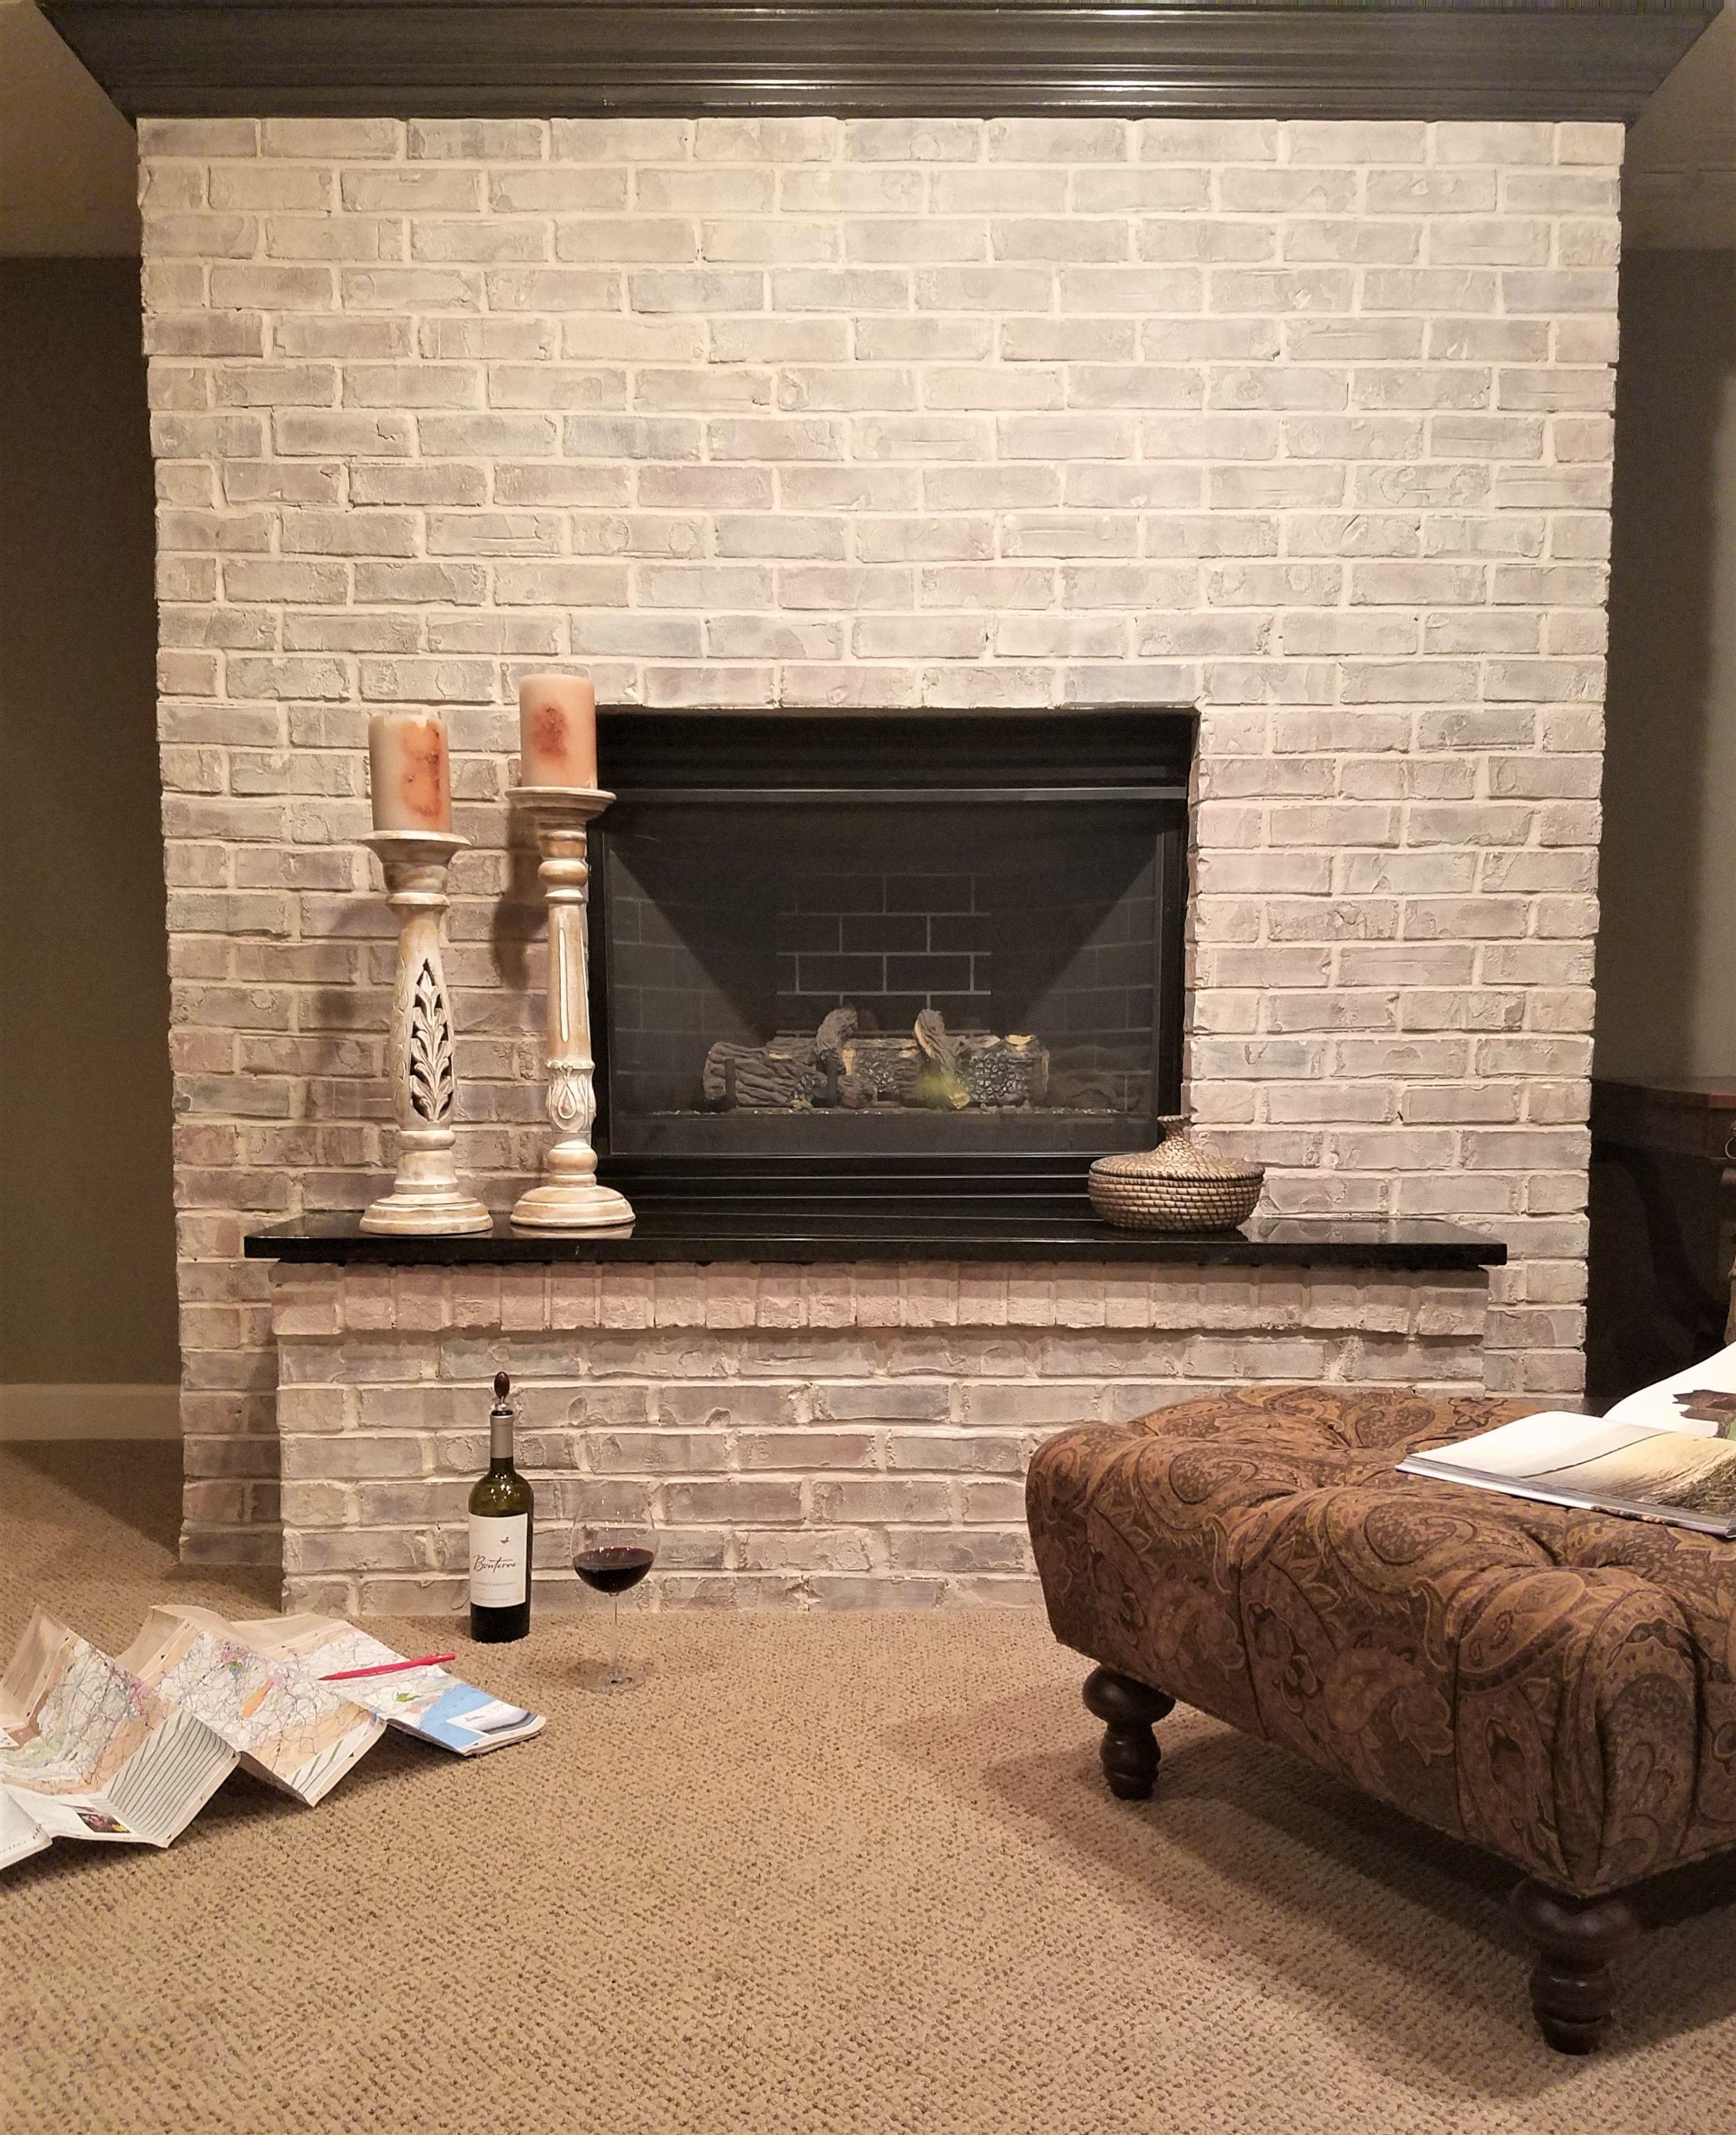 How to Whitewash a Brick or Stone Fireplace Brick, Decor